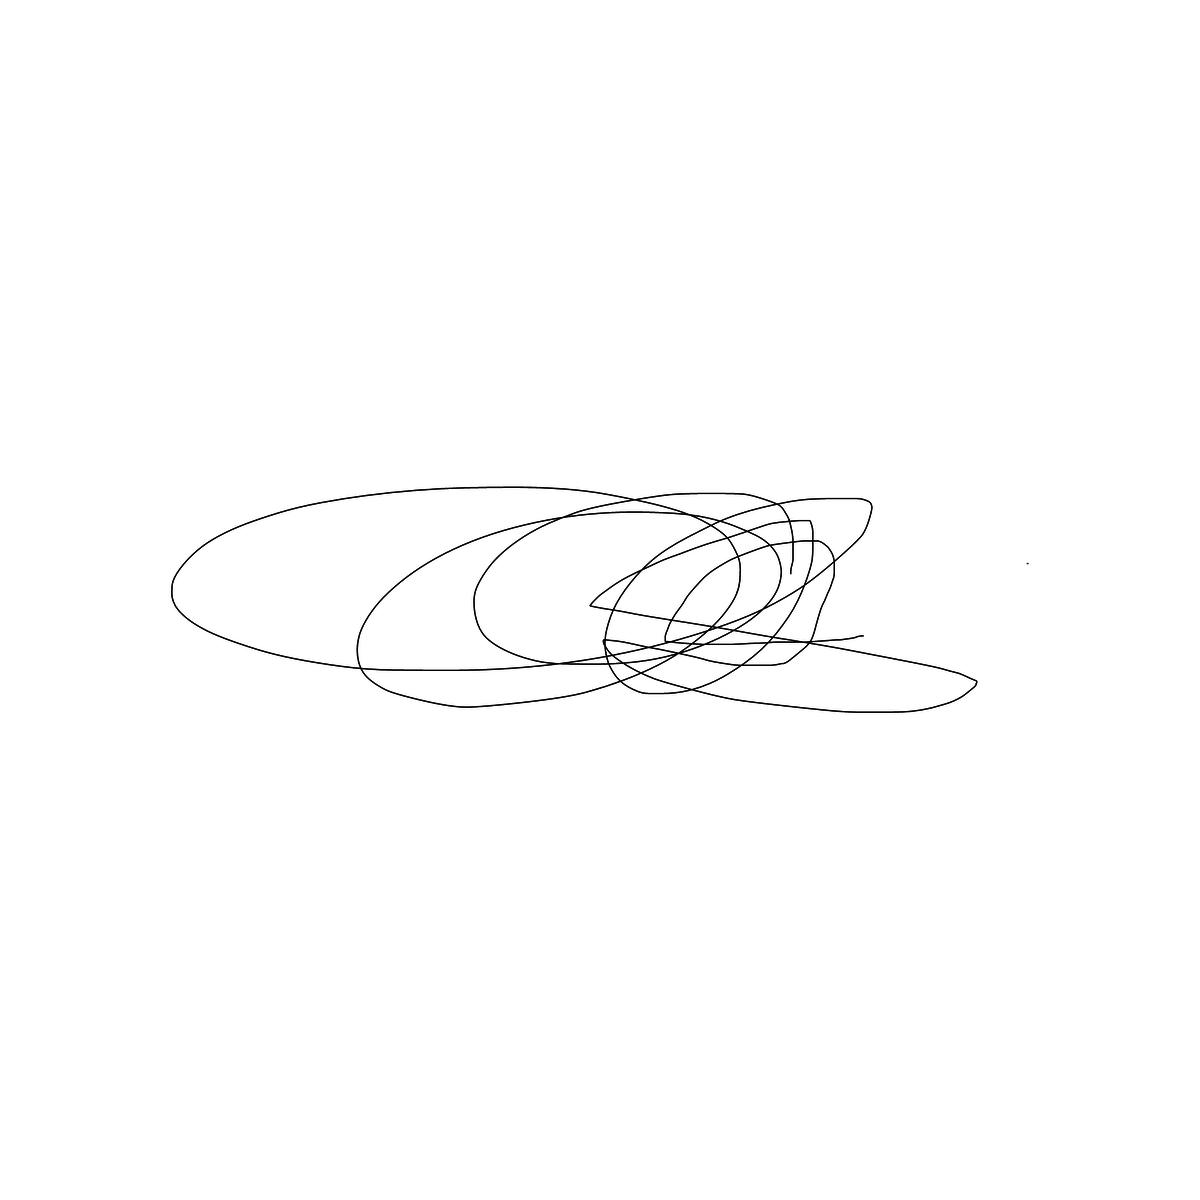 BAAAM drawing#7098 lat:-27.4786834716796880lng: 153.0214843750000000